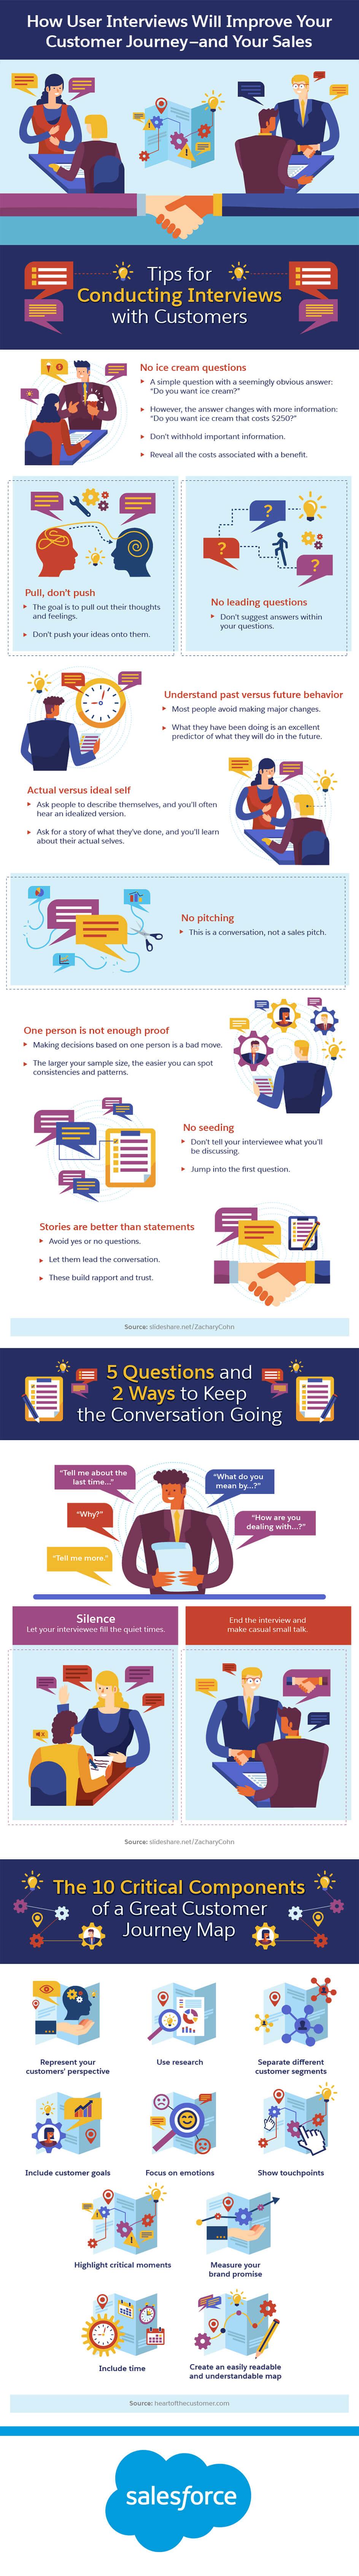 user interviews infographic